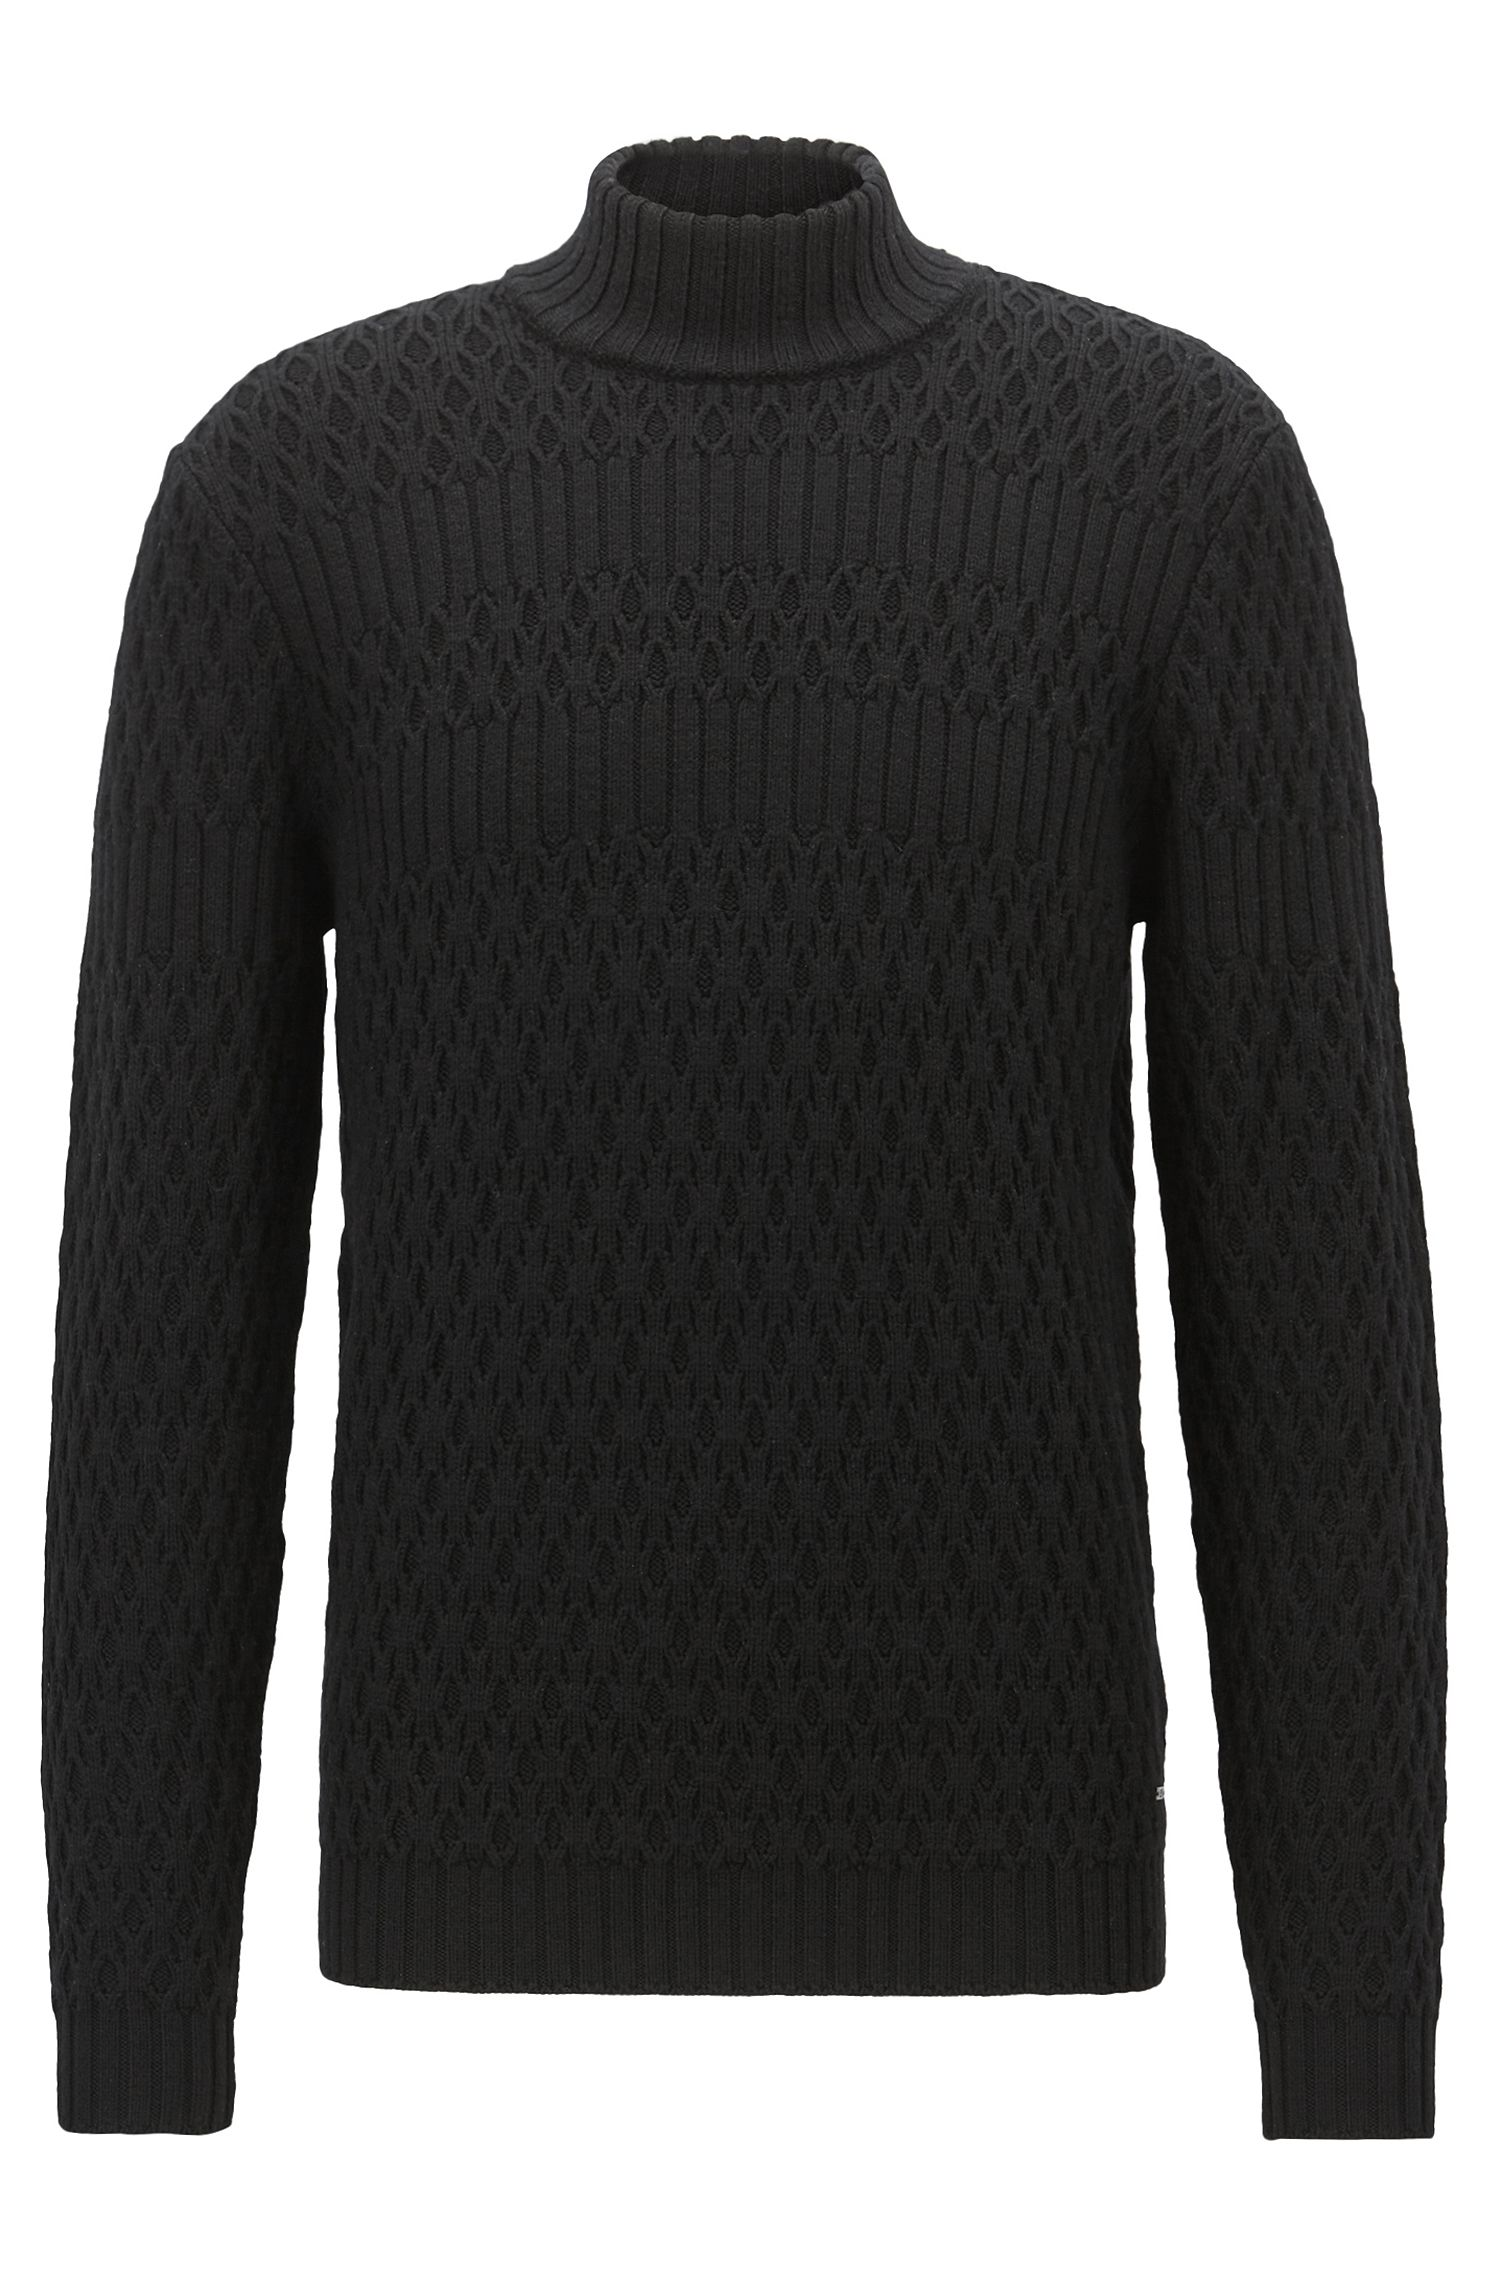 Jersey de manga larga en lana virgen con cuello alto